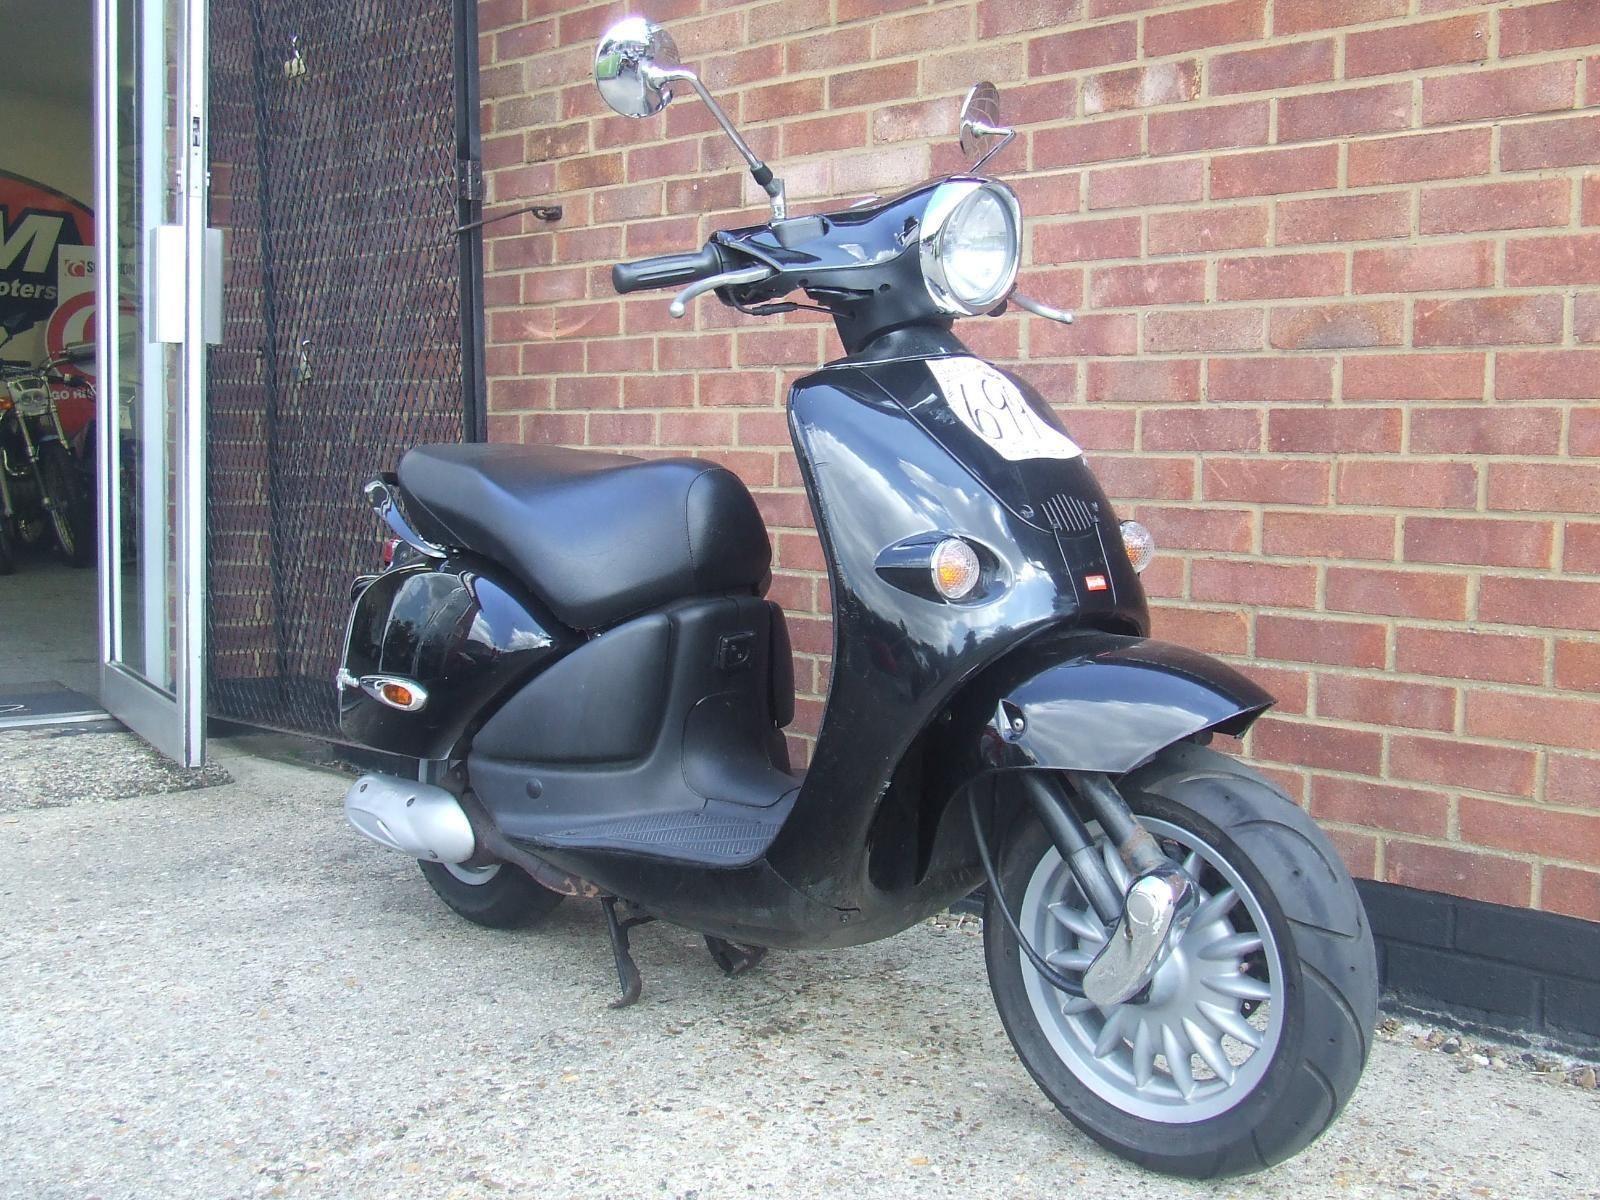 2001 aprilia habana 49cc scooter black. Black Bedroom Furniture Sets. Home Design Ideas